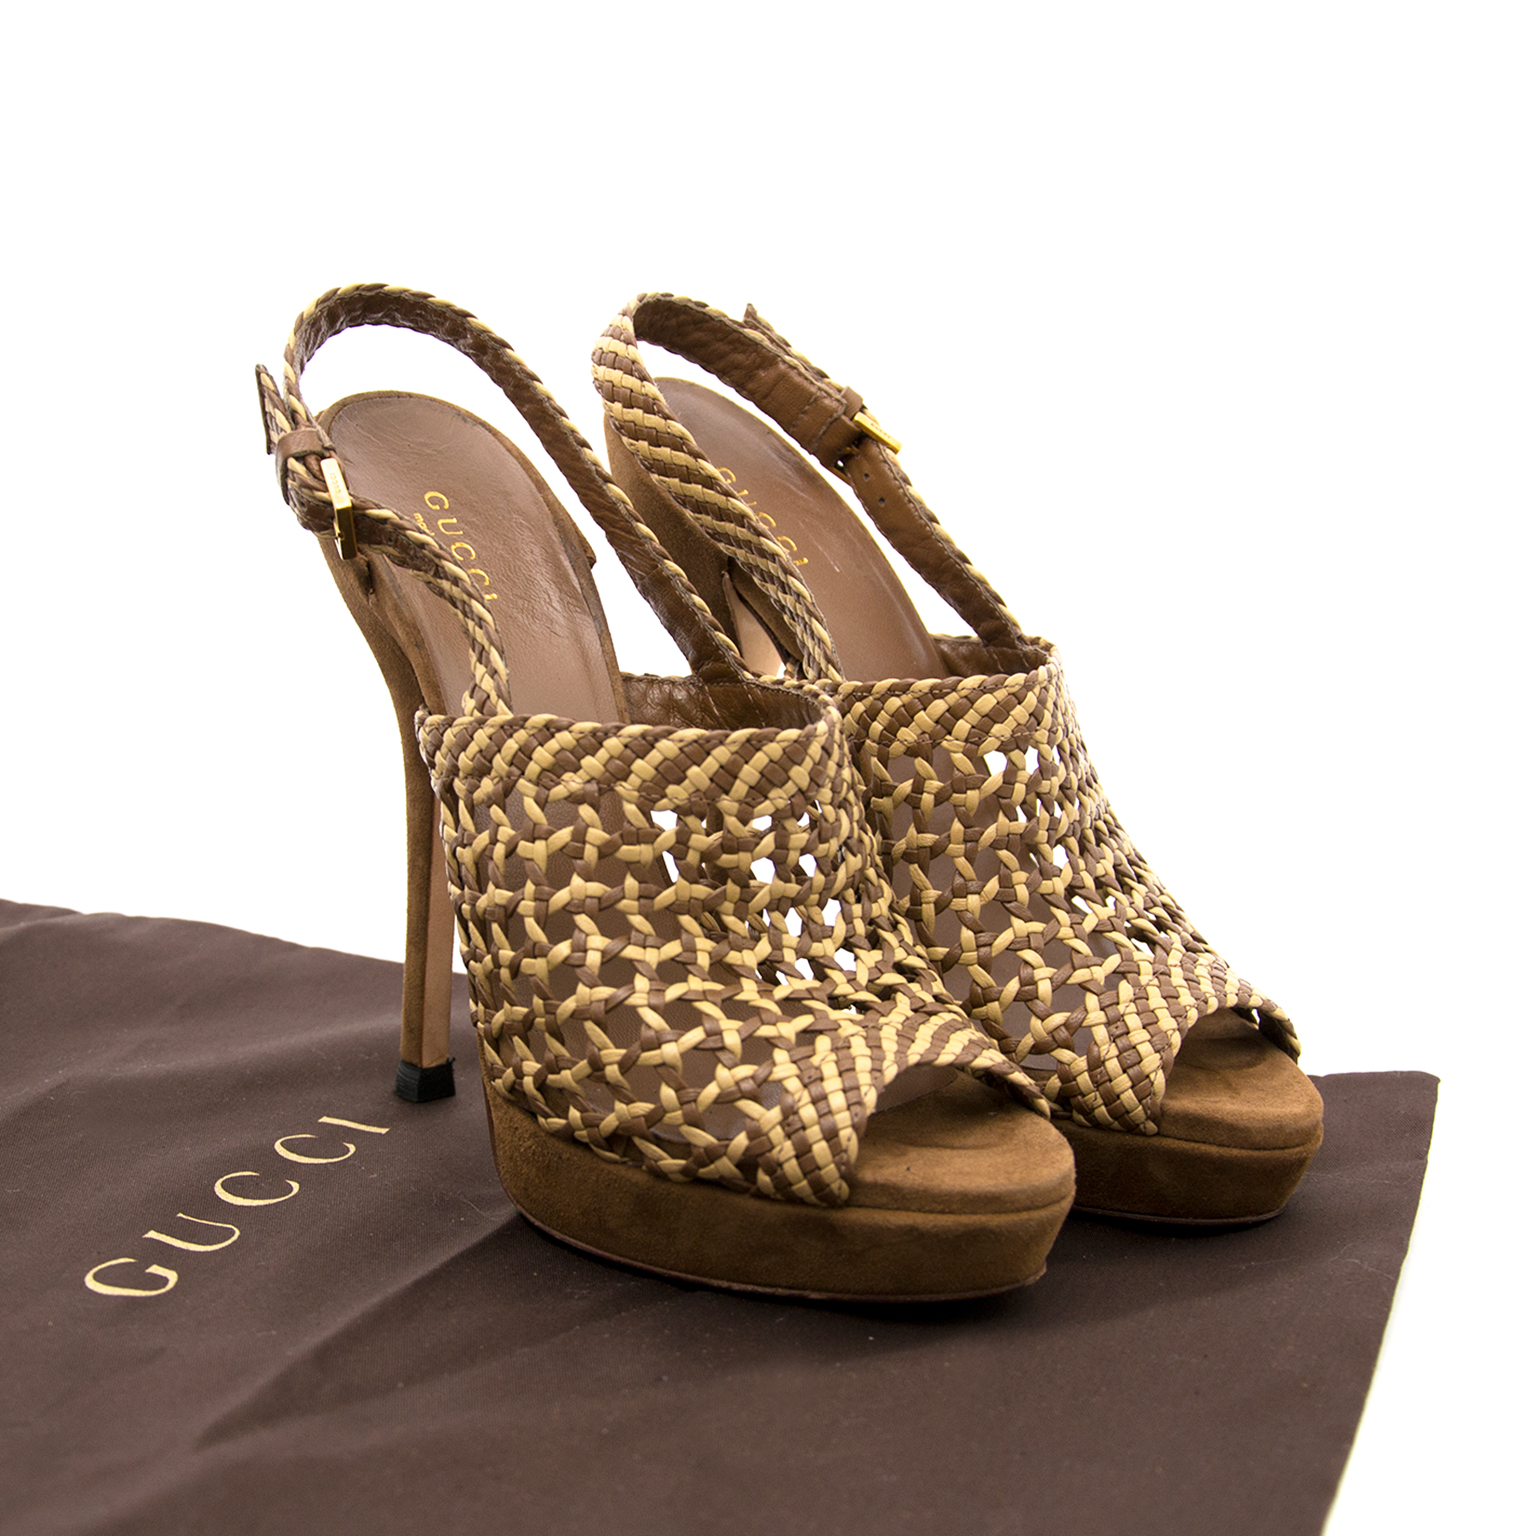 Acheter des Gucci Woven Leather Heels Size 37chez labellov.com